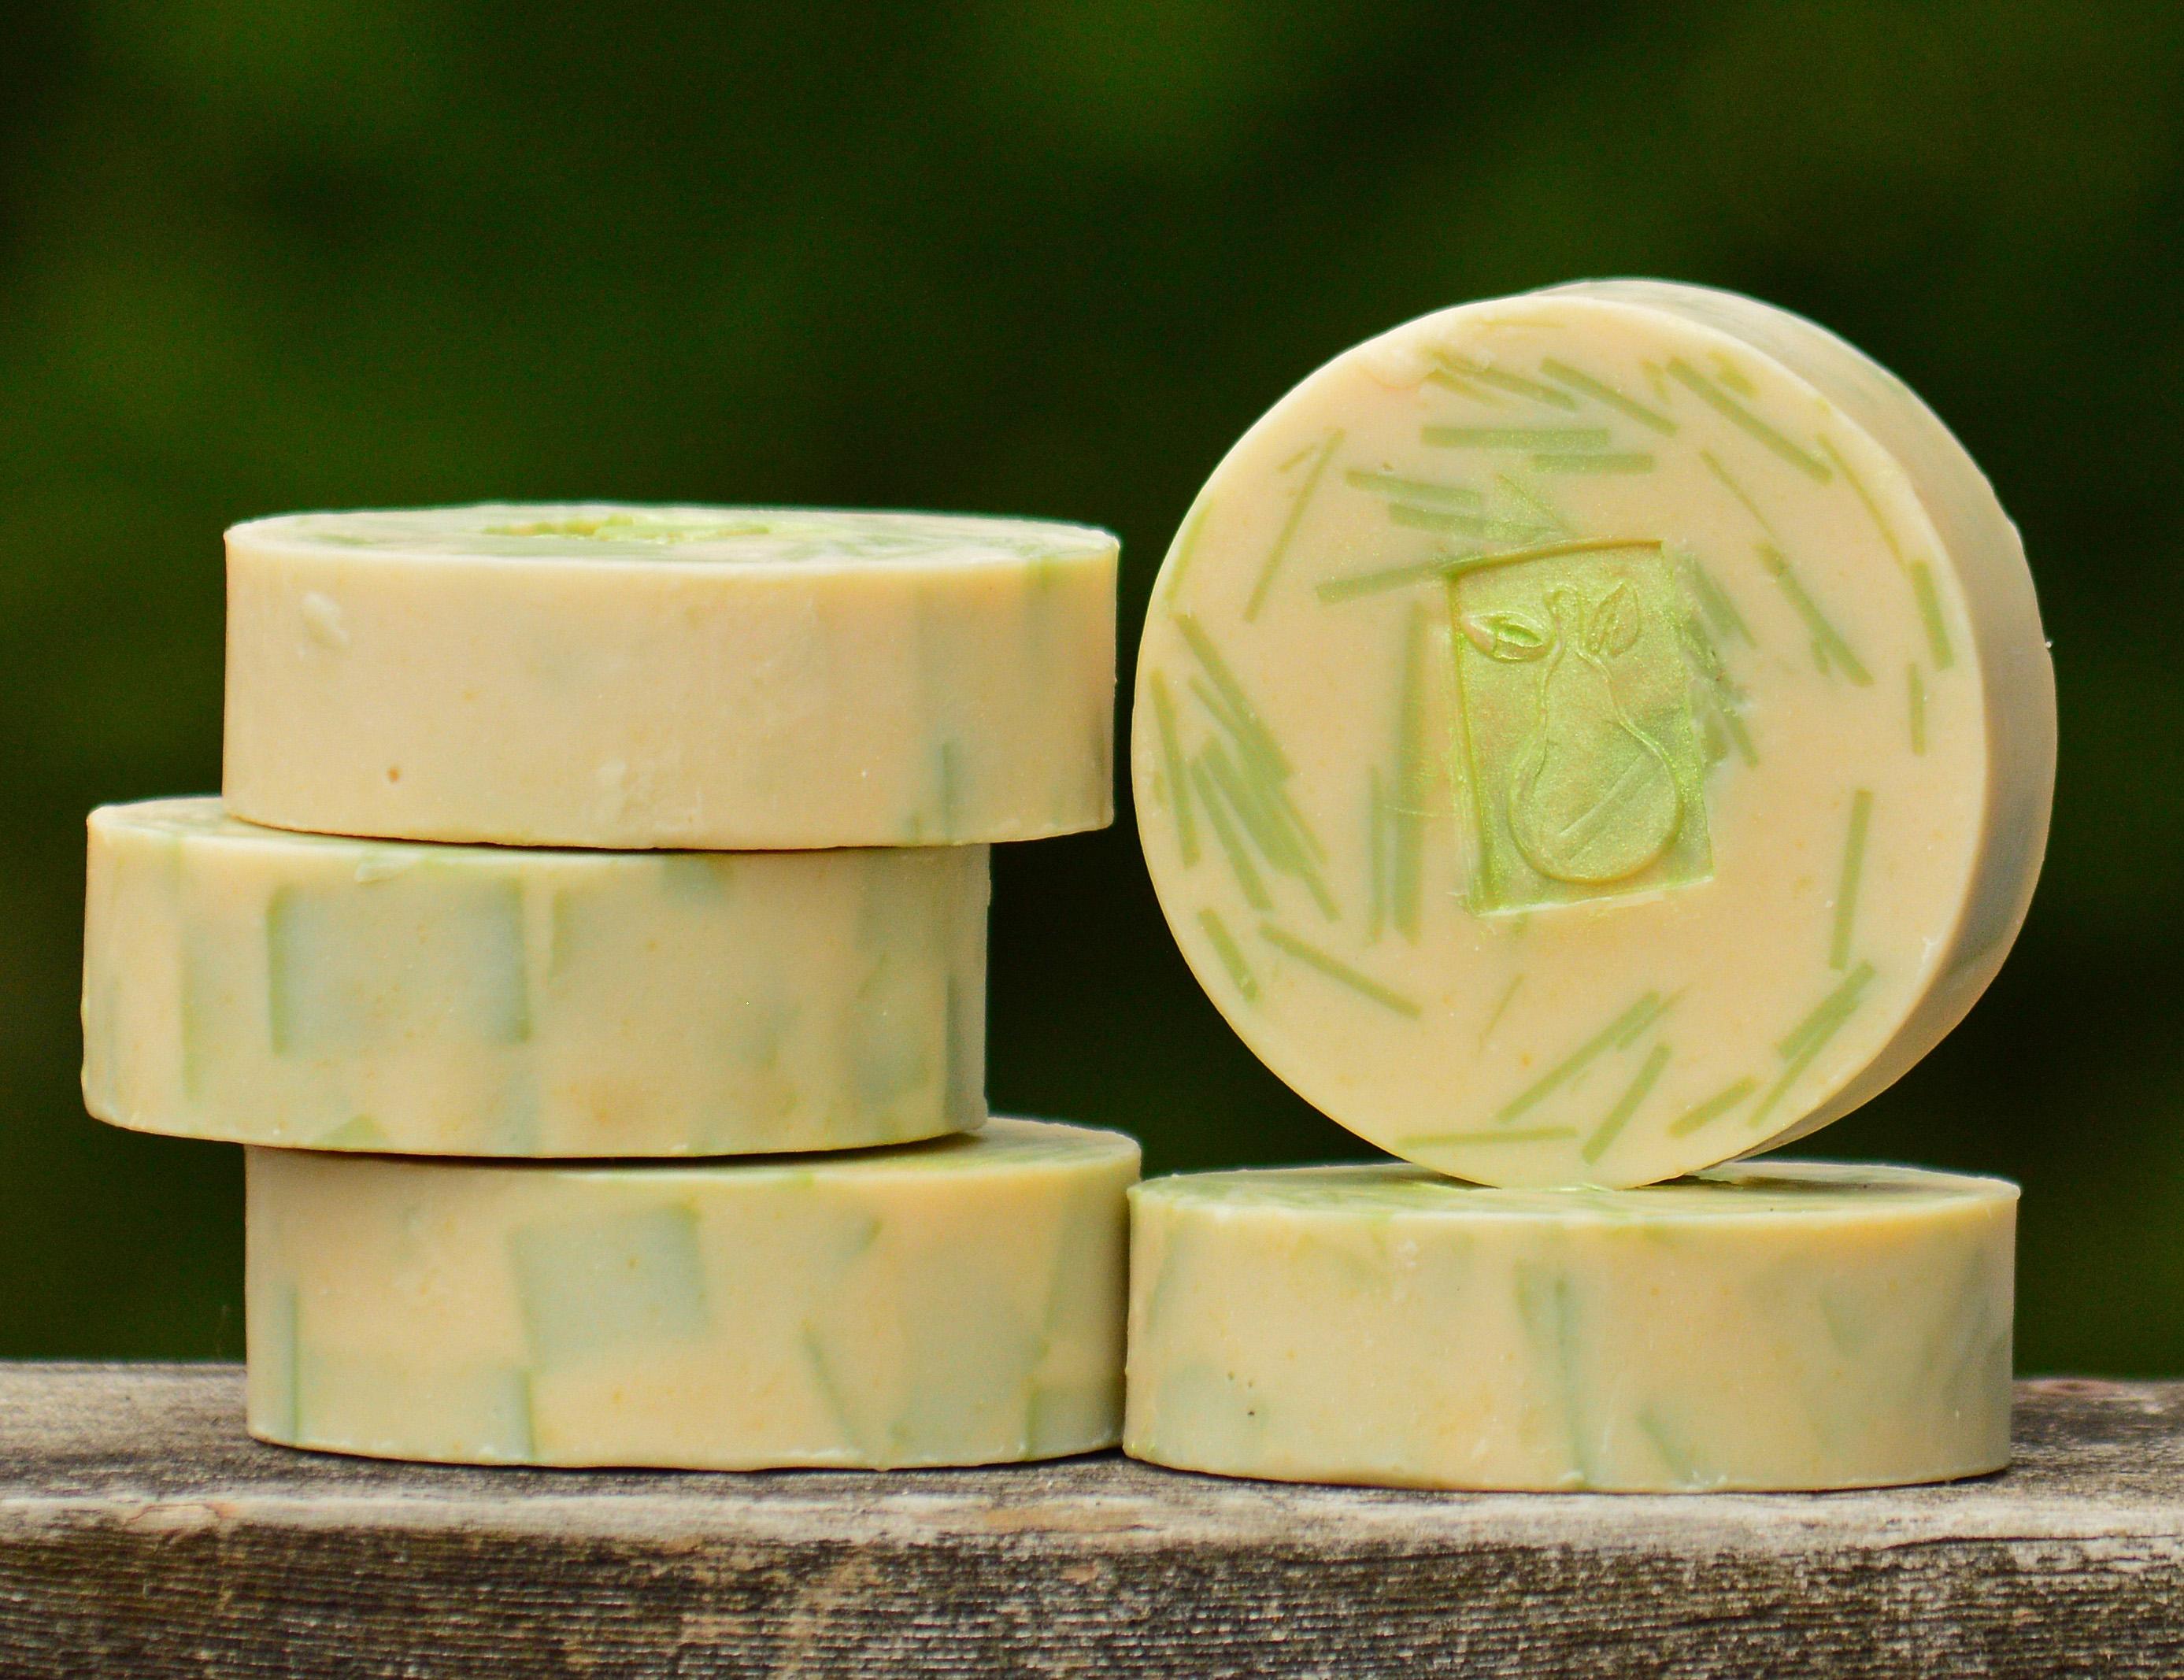 Green Tea & Pear Classic Soap